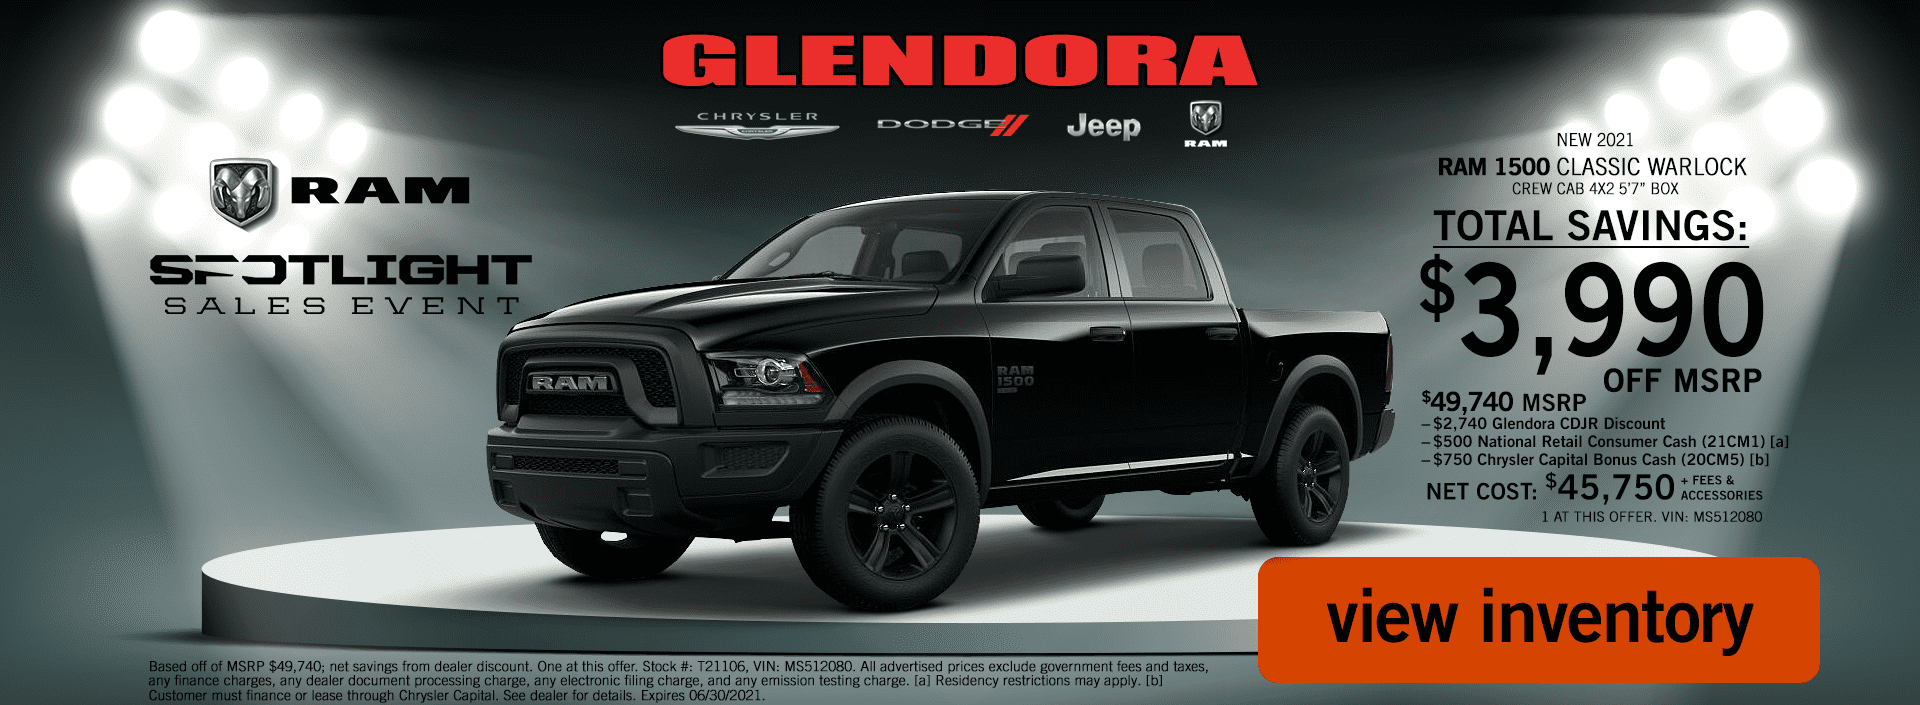 Glendora_CDJR_2021_June_Ram_Spotlight_Sales_Event_Ram_1500_Classic_Warlock_Deal